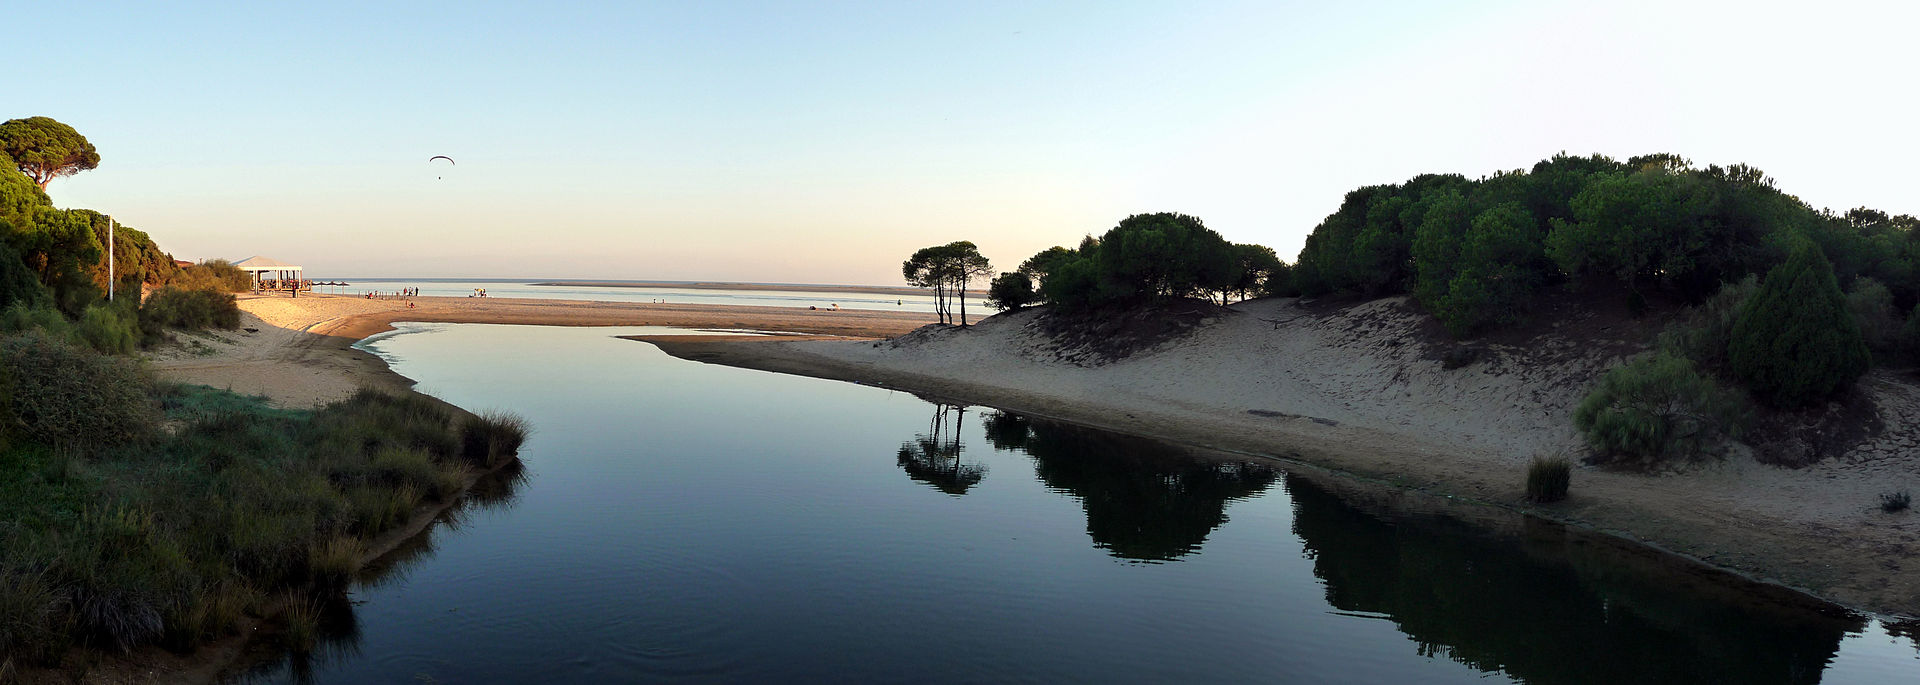 Playa de El Portil - Caño de la Culata (Punta Umbría)